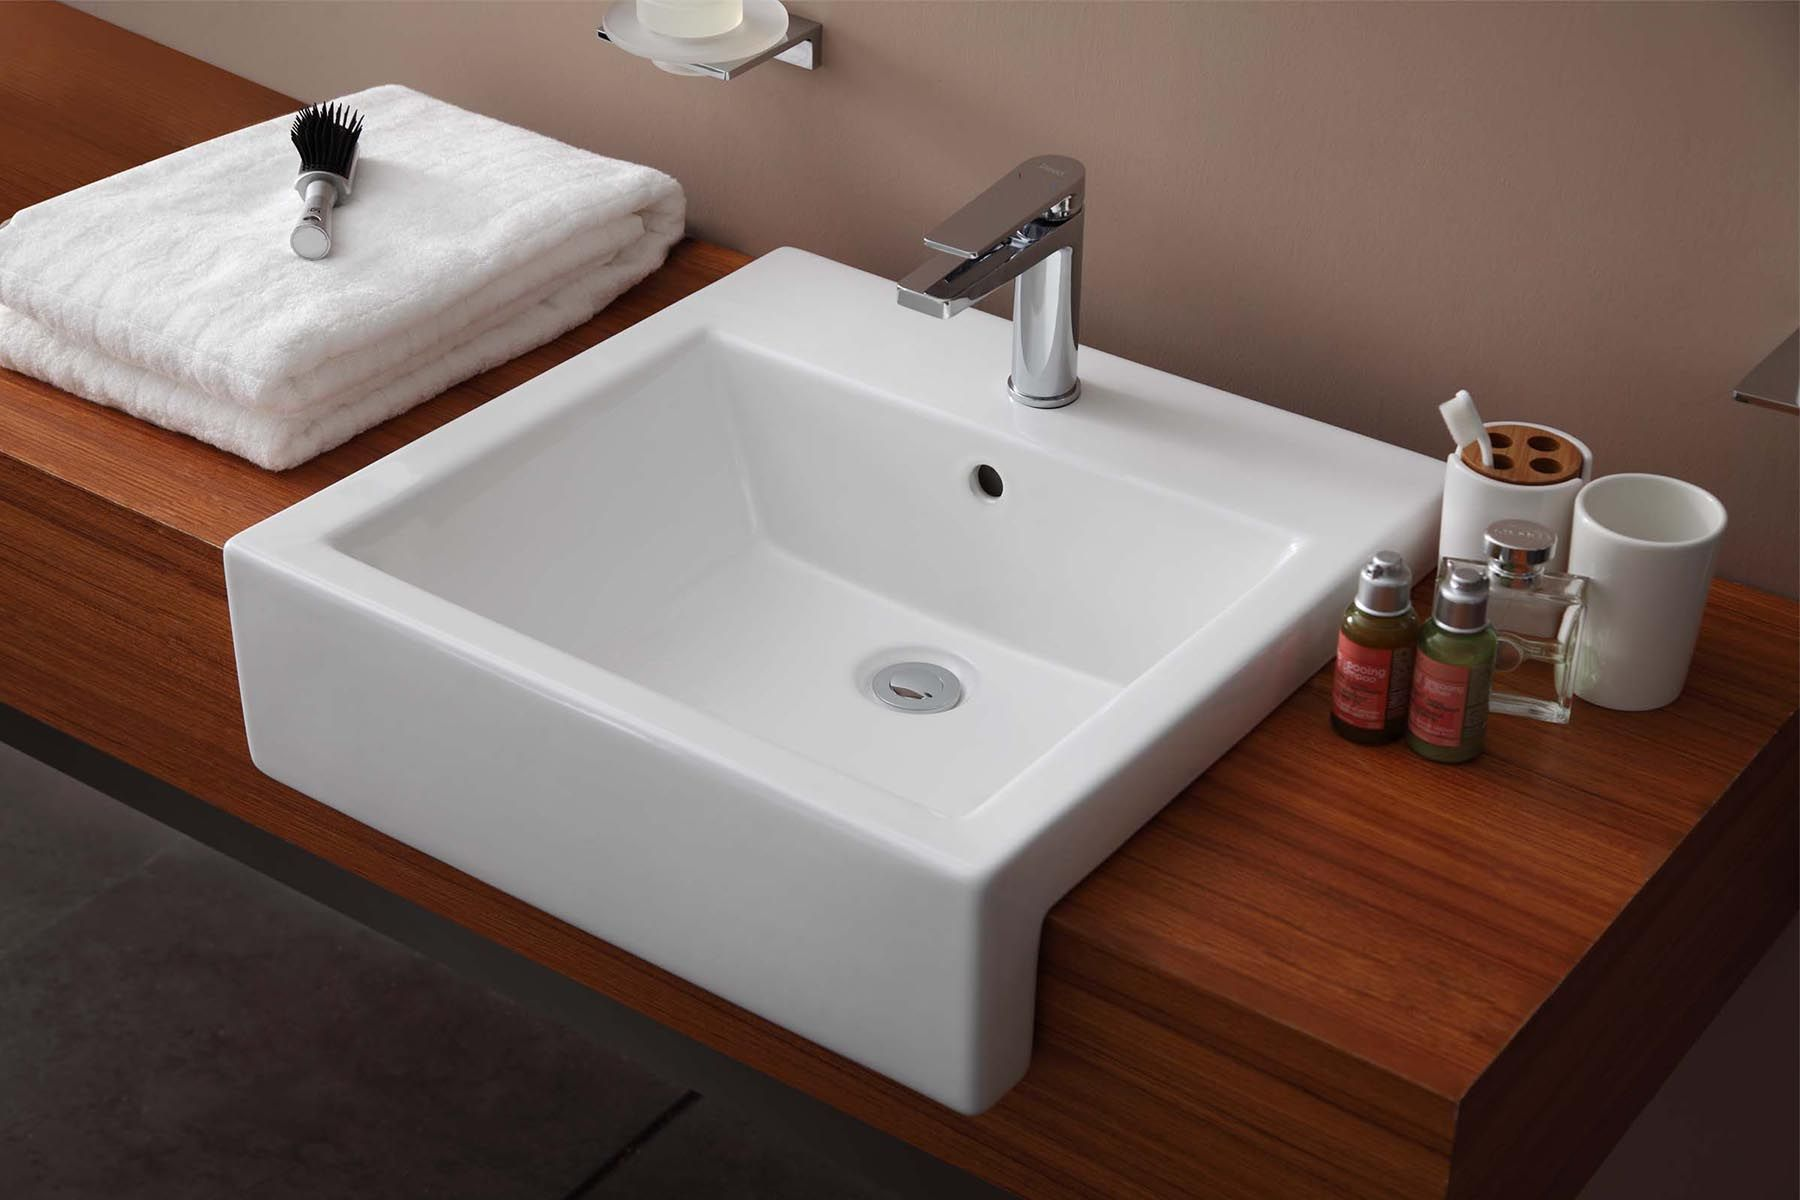 Recessed Bathroom Basins Rectangular Sink Bathroom Sink Wall Mounted Bathroom Sinks